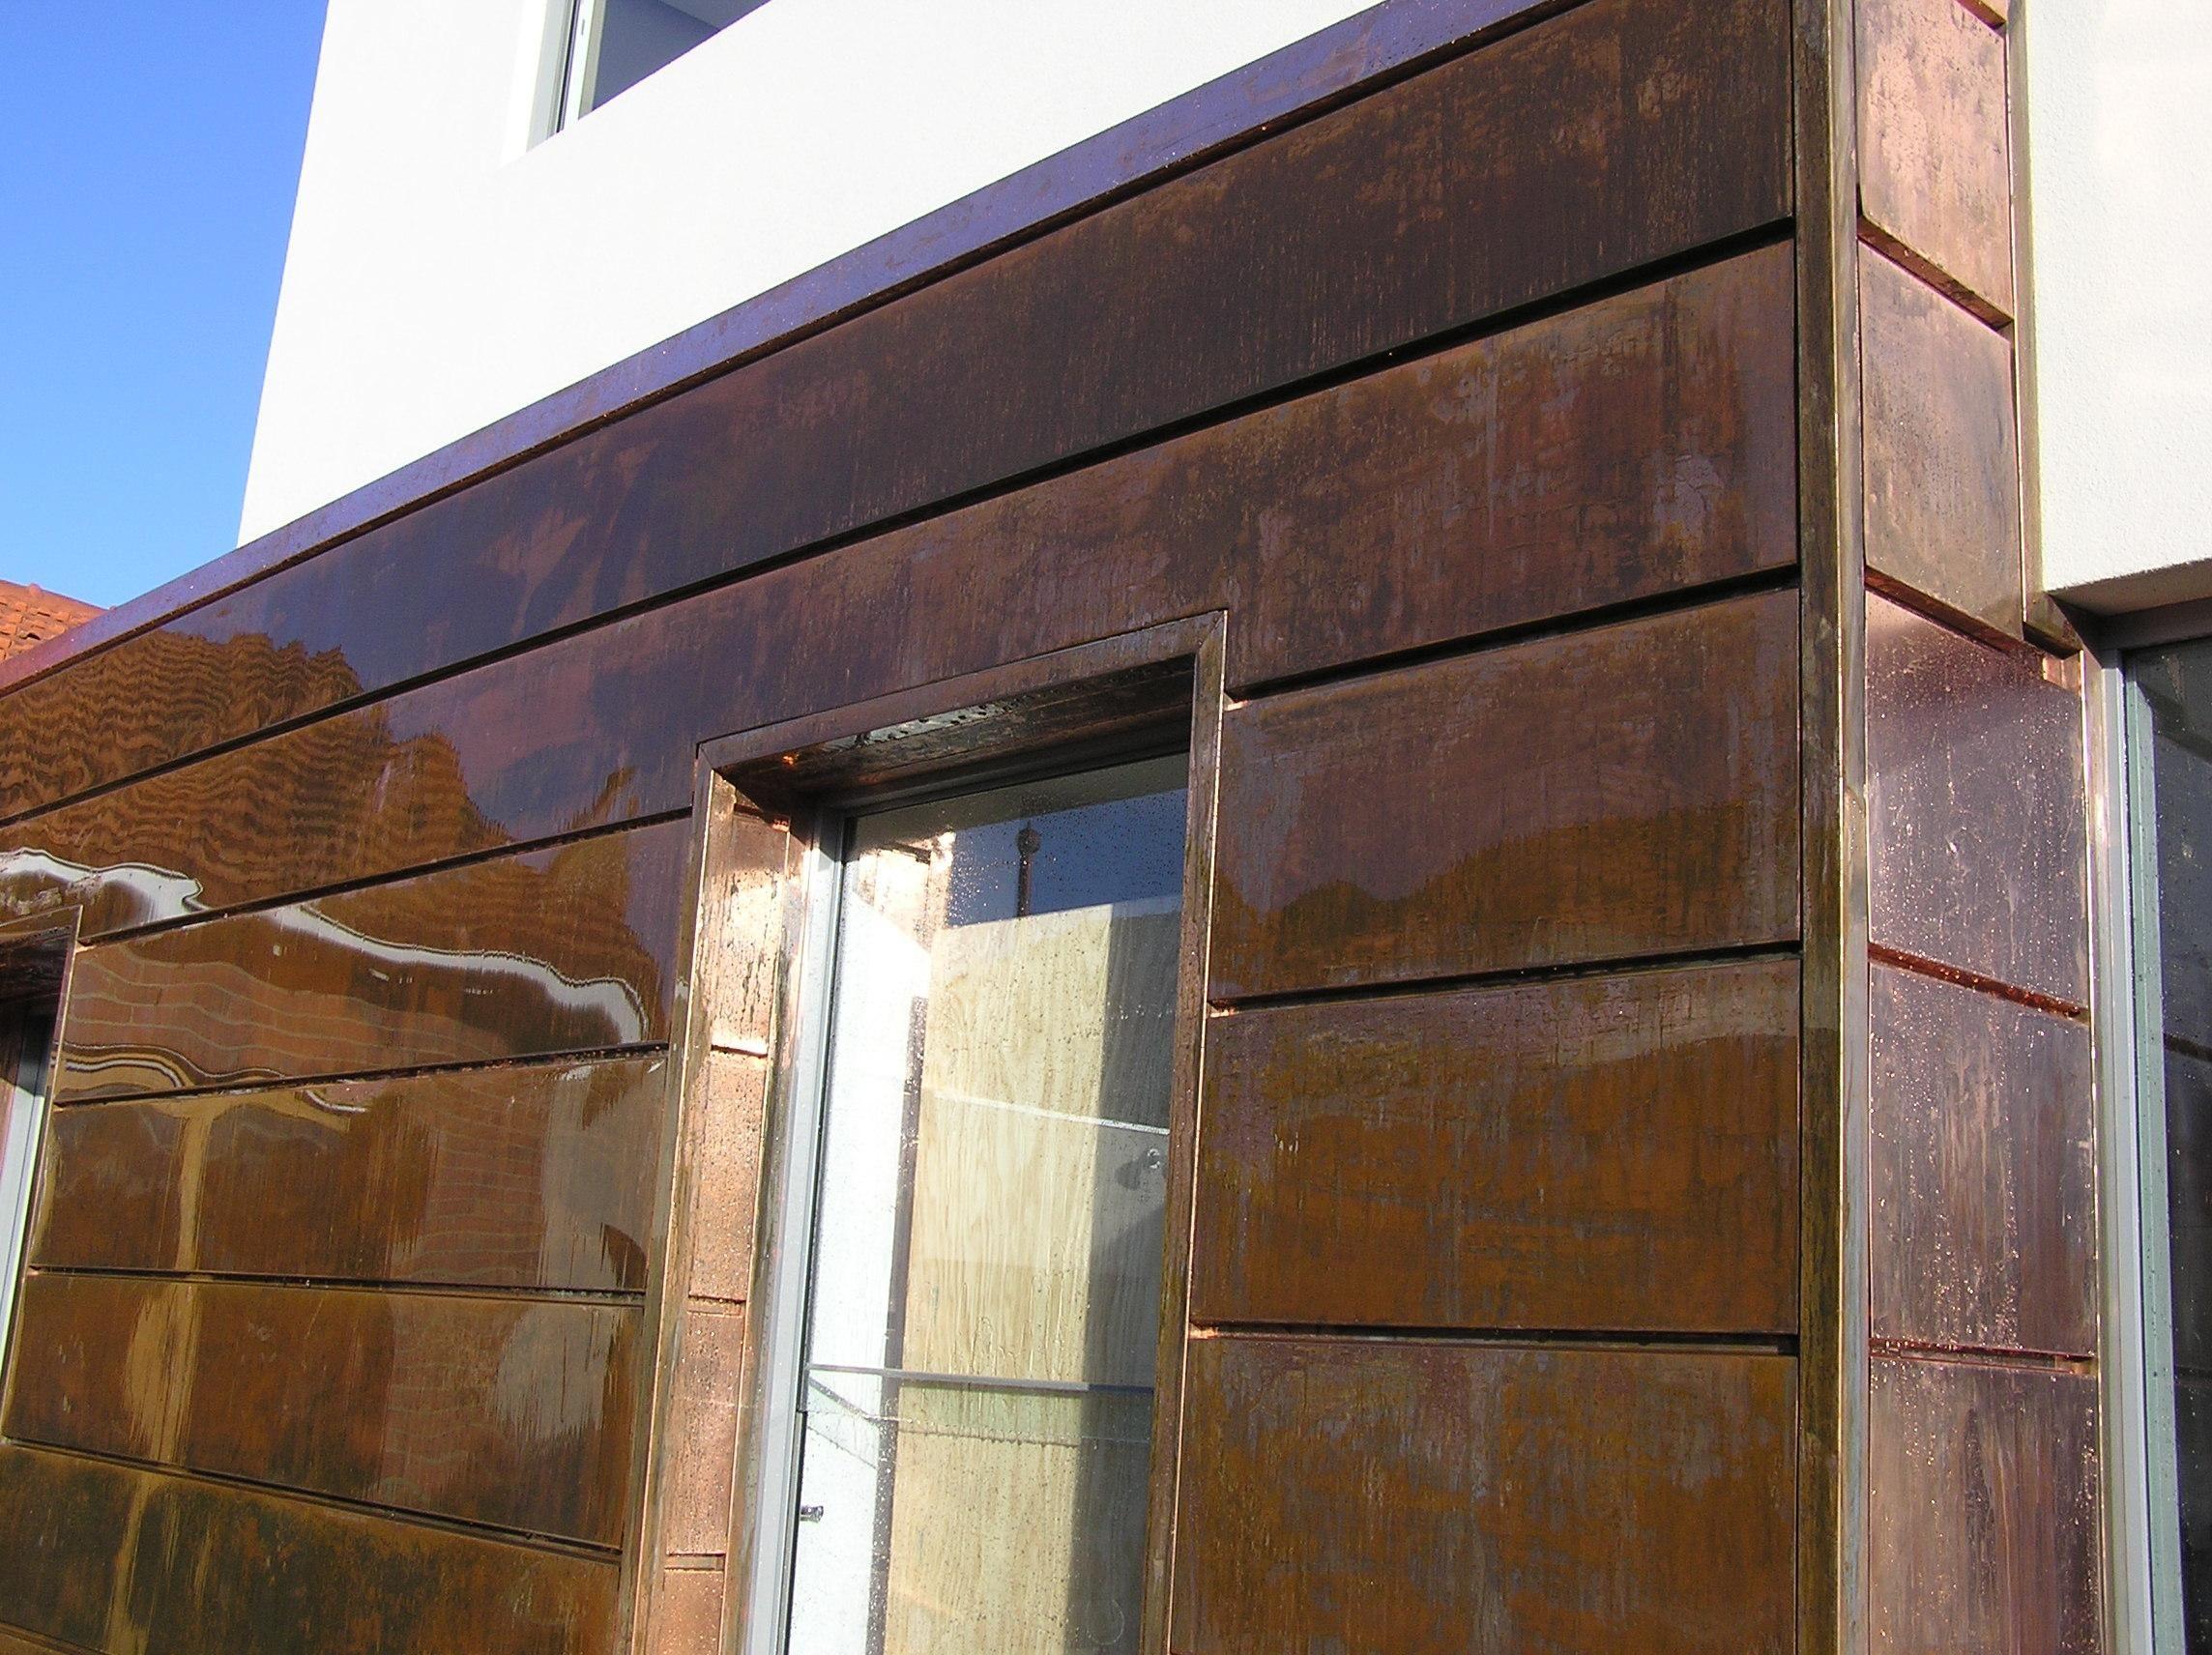 copper panel images - Google Search   shutters   Pinterest ...